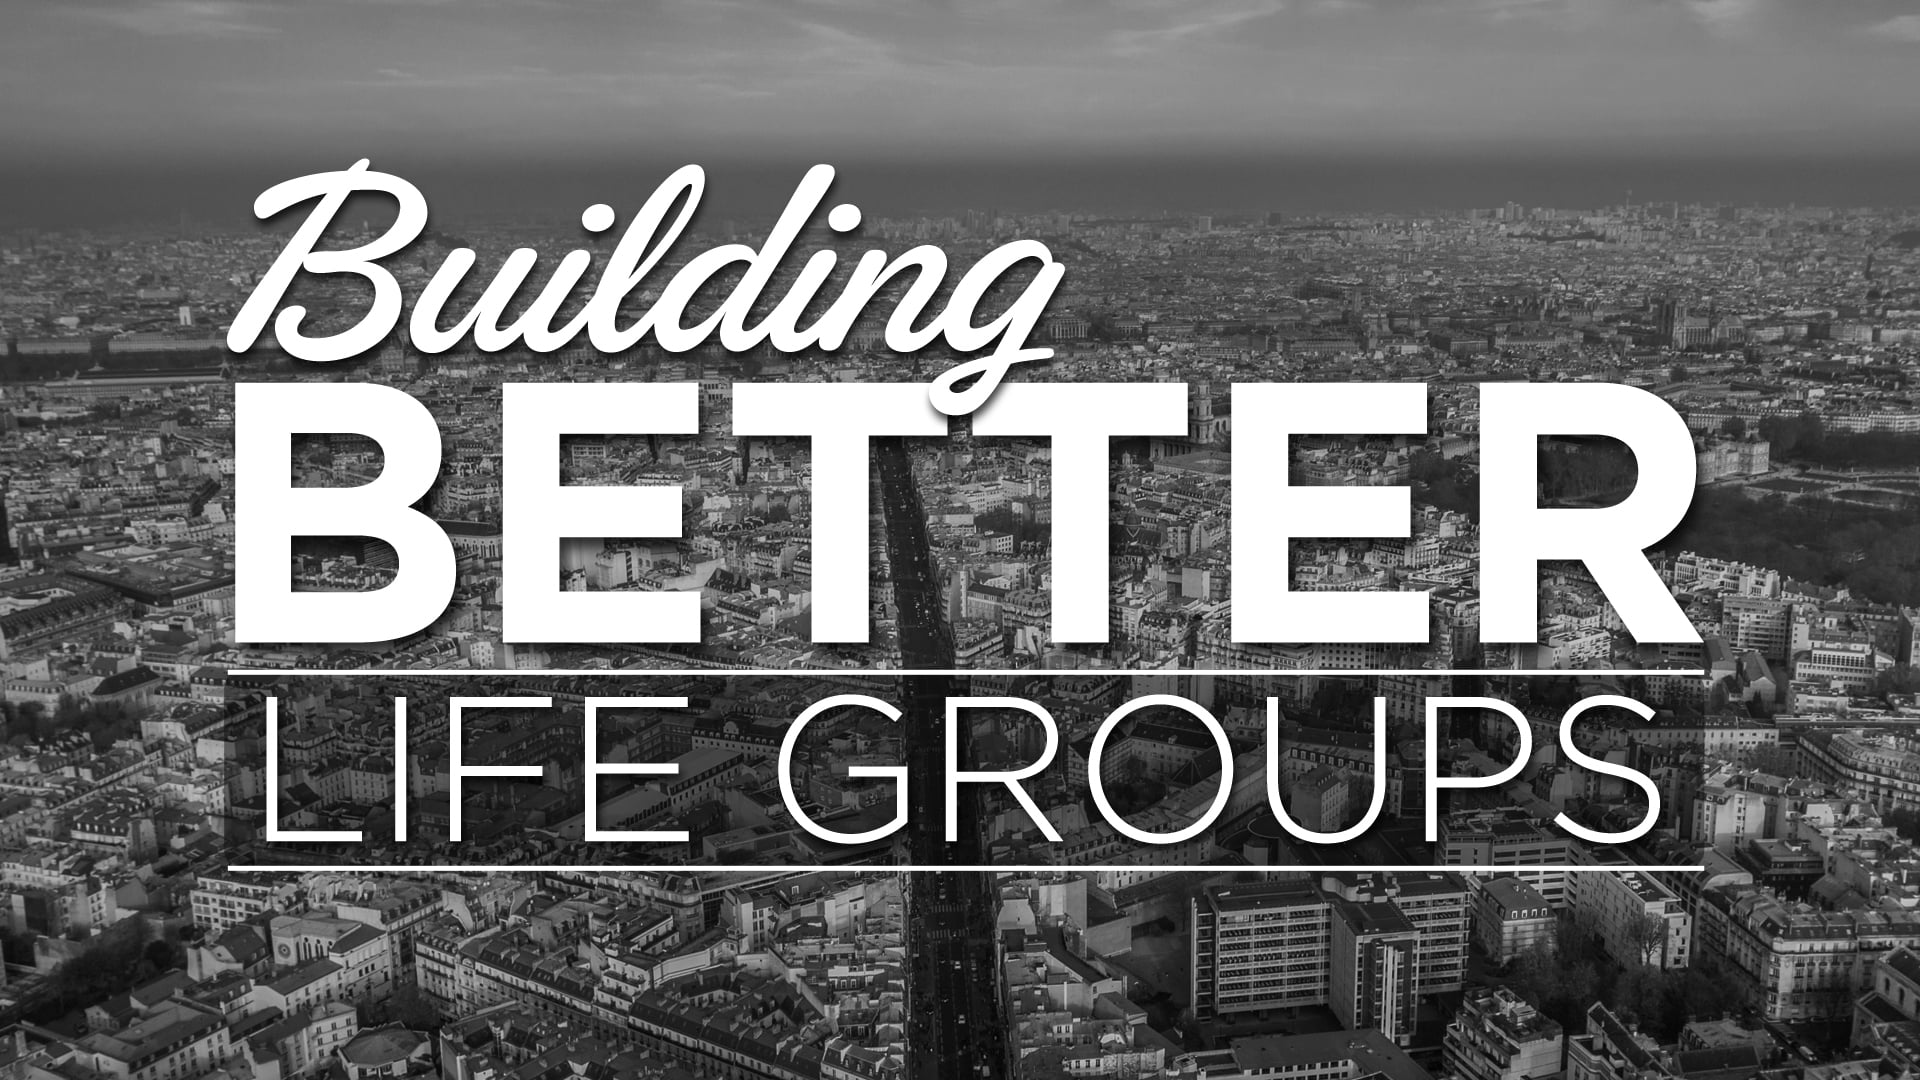 Life groups [3] - An Atmosphere of Wonder